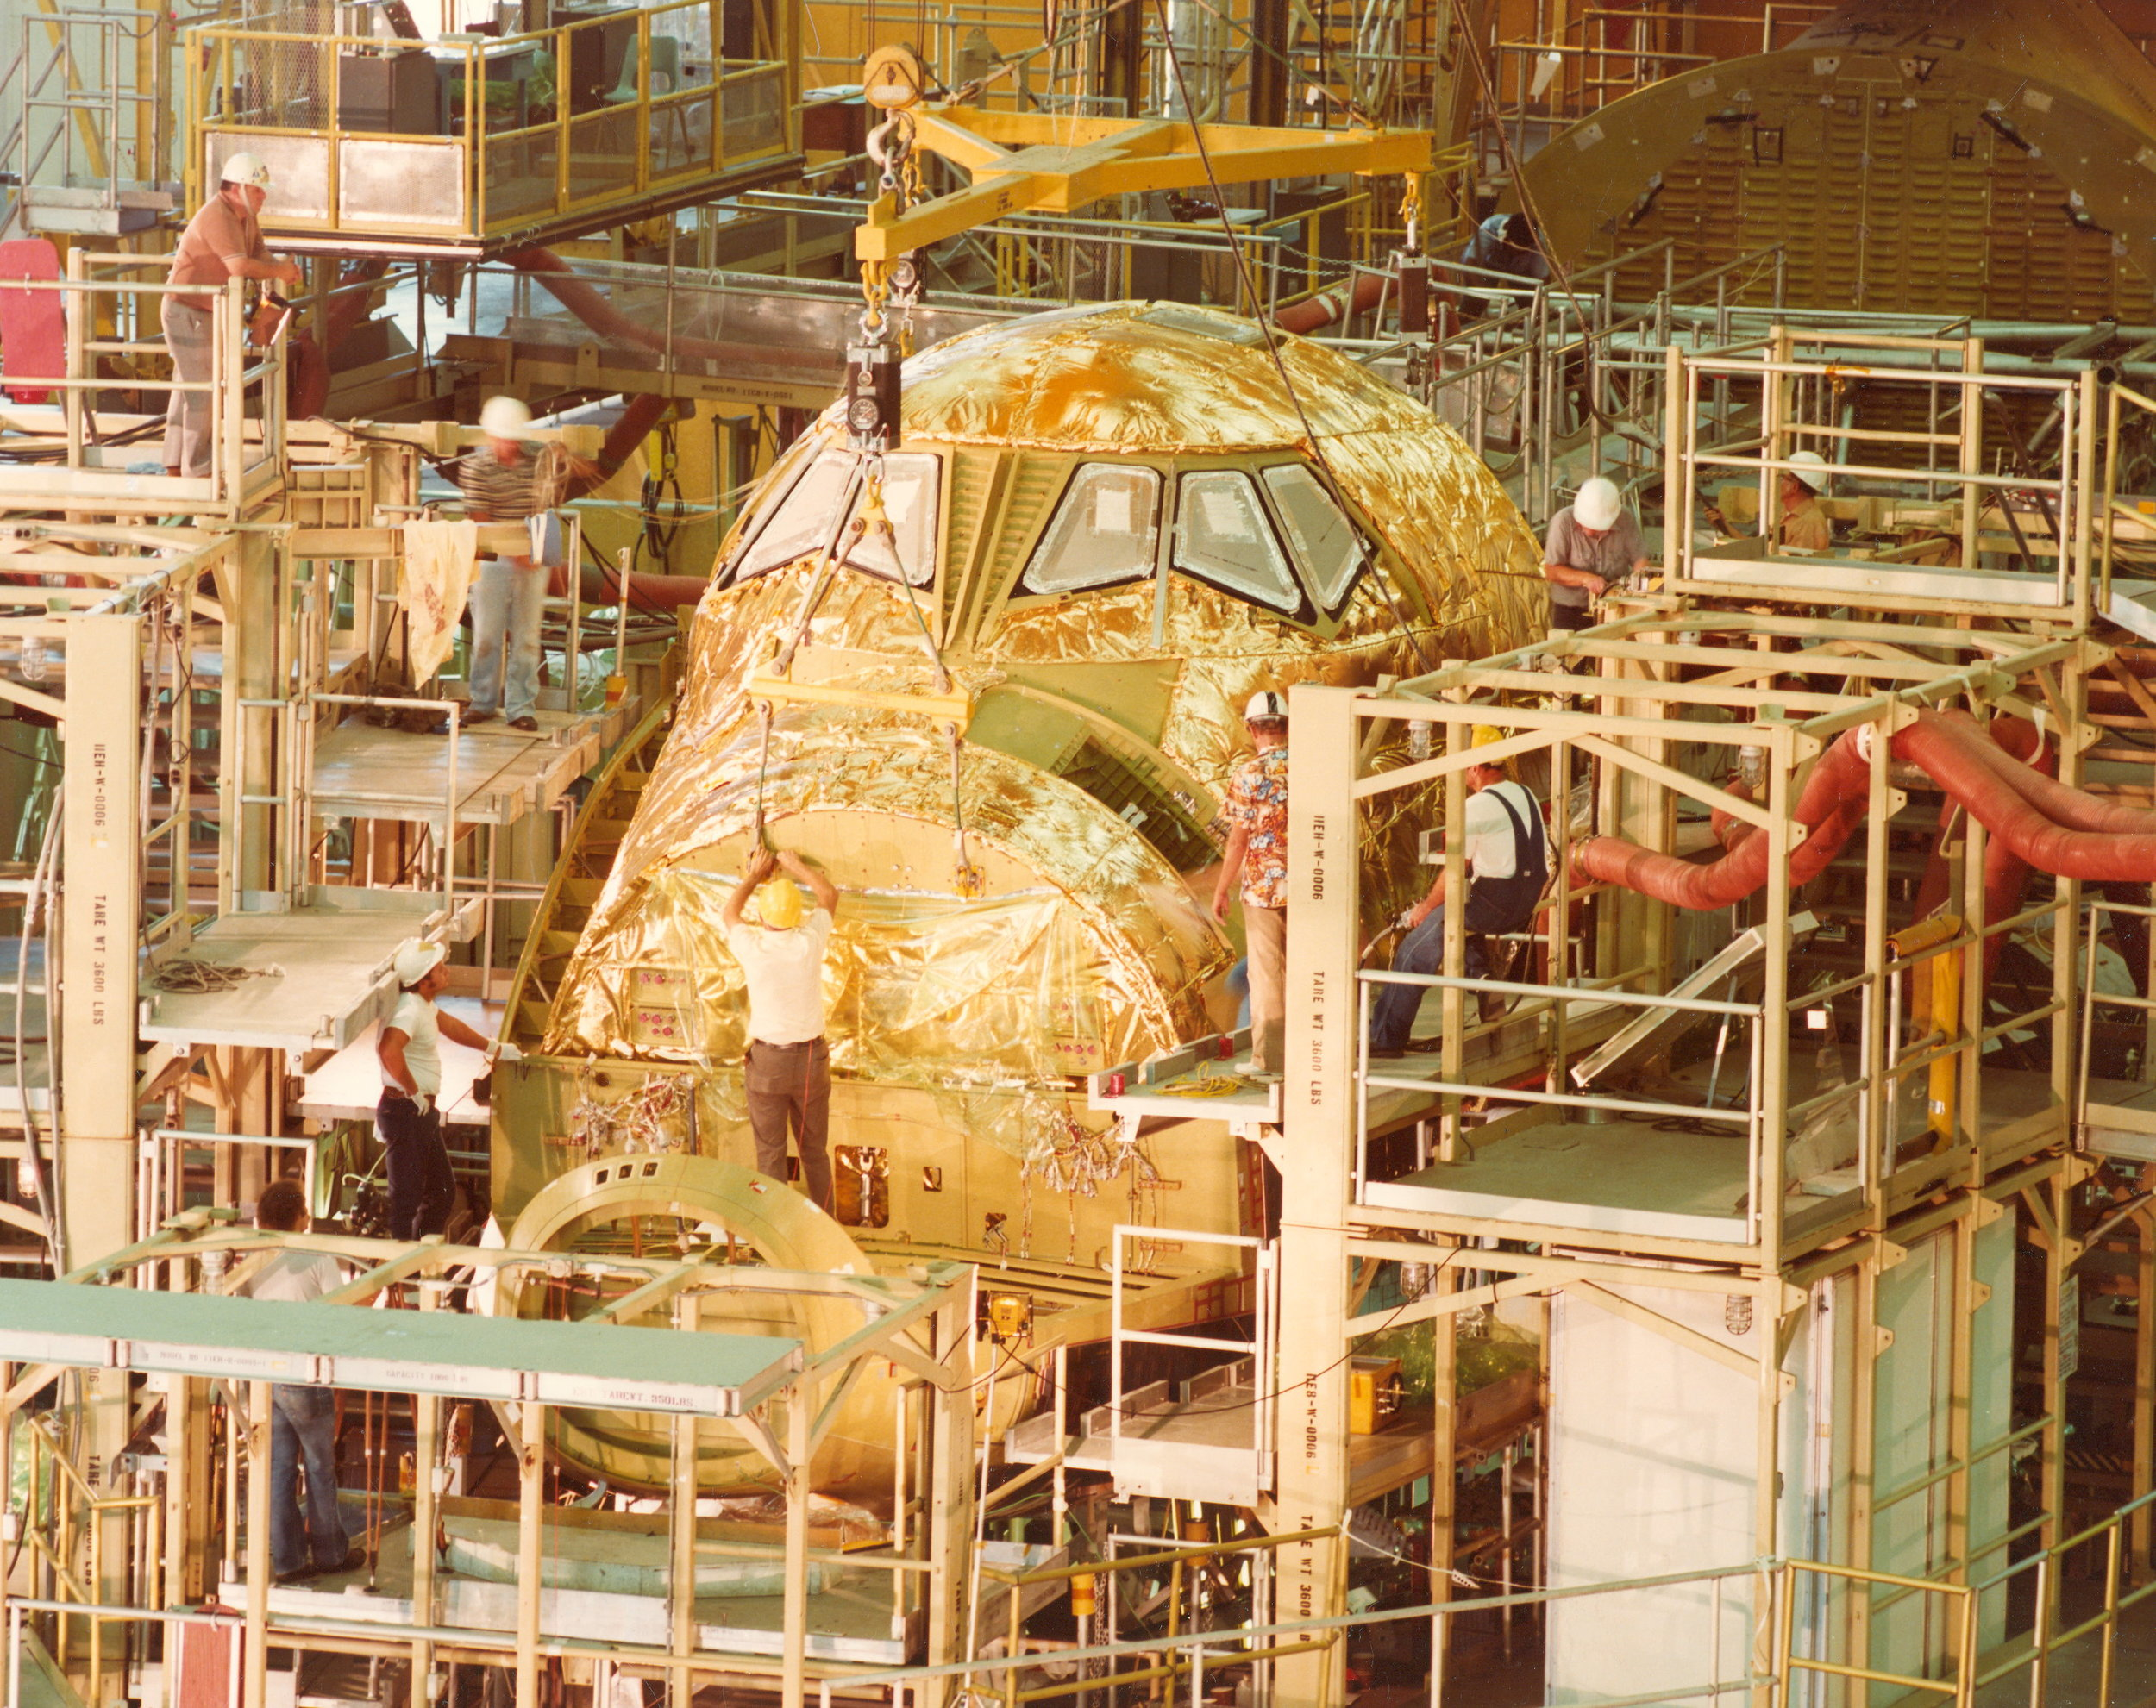 orbiter crew compartment under construction.jpg